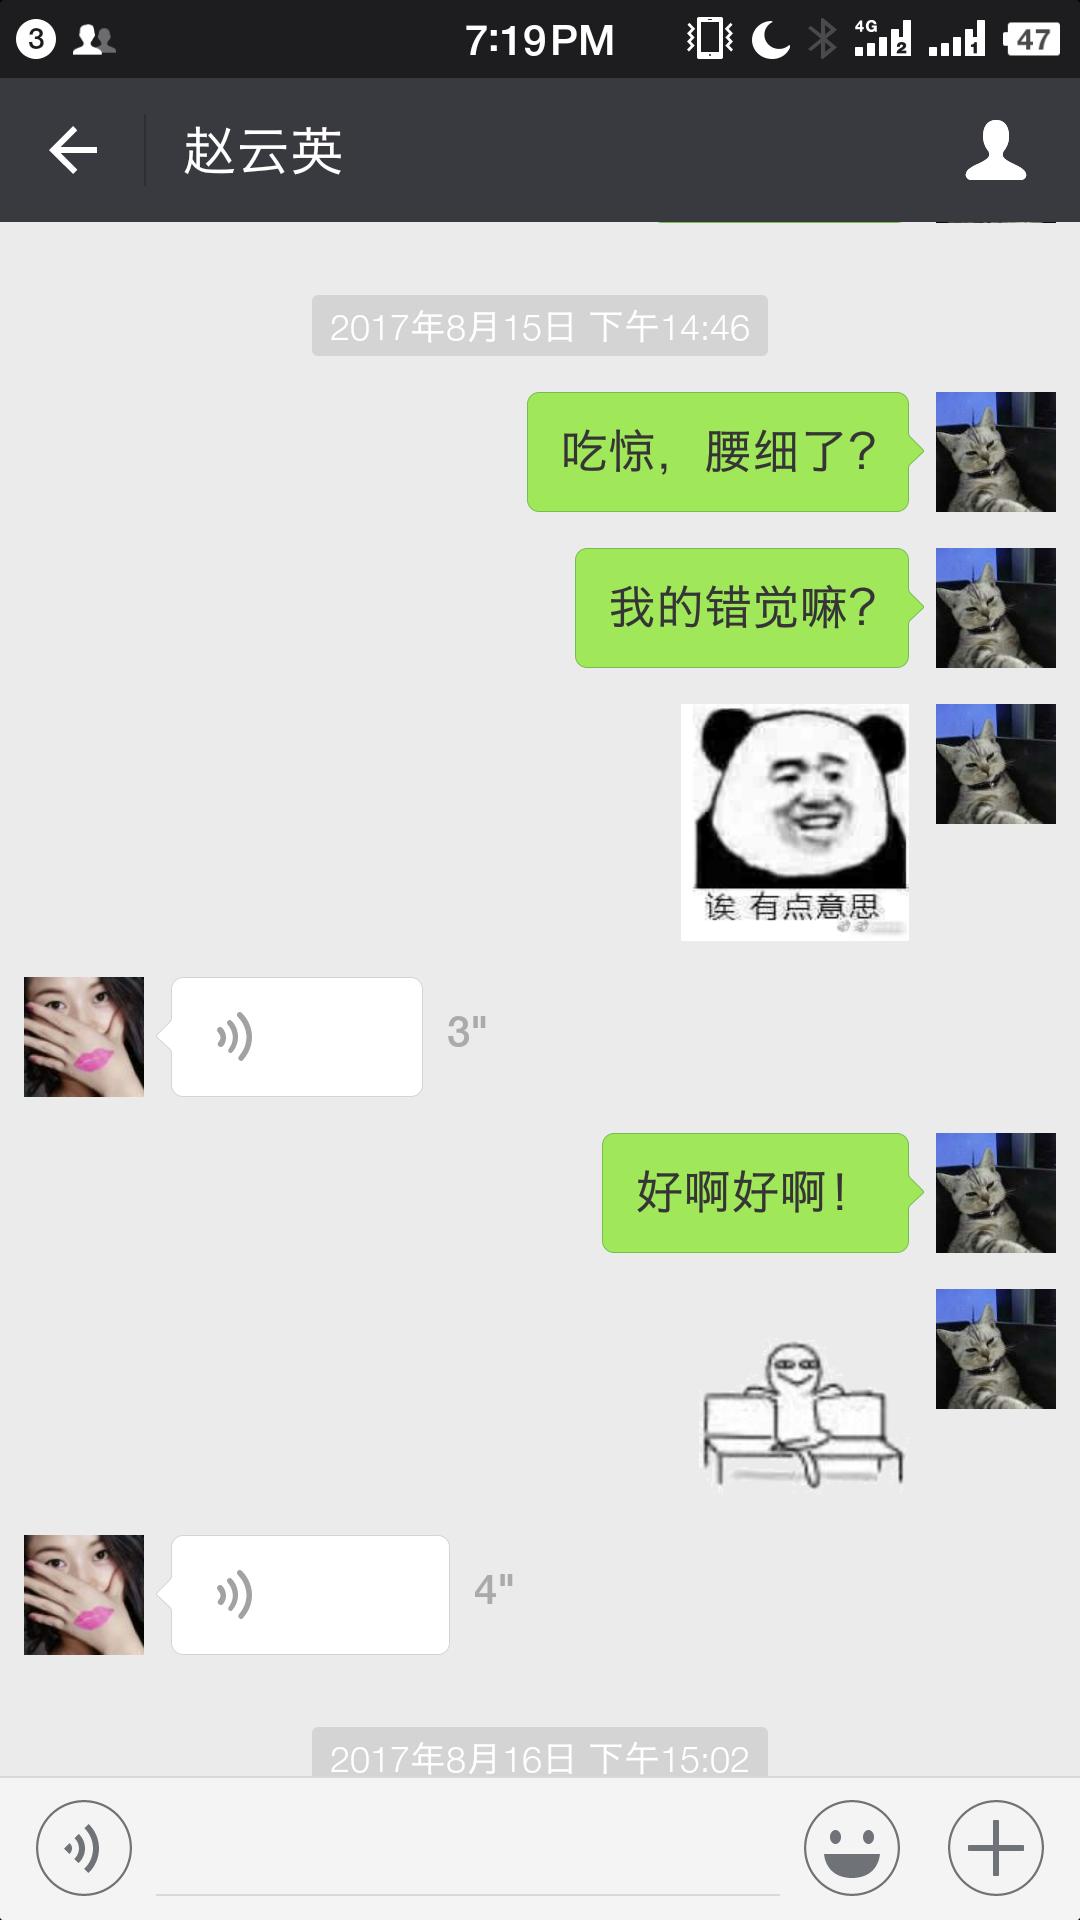 Screenshot_2018-01-04-19-19-57-447_微信